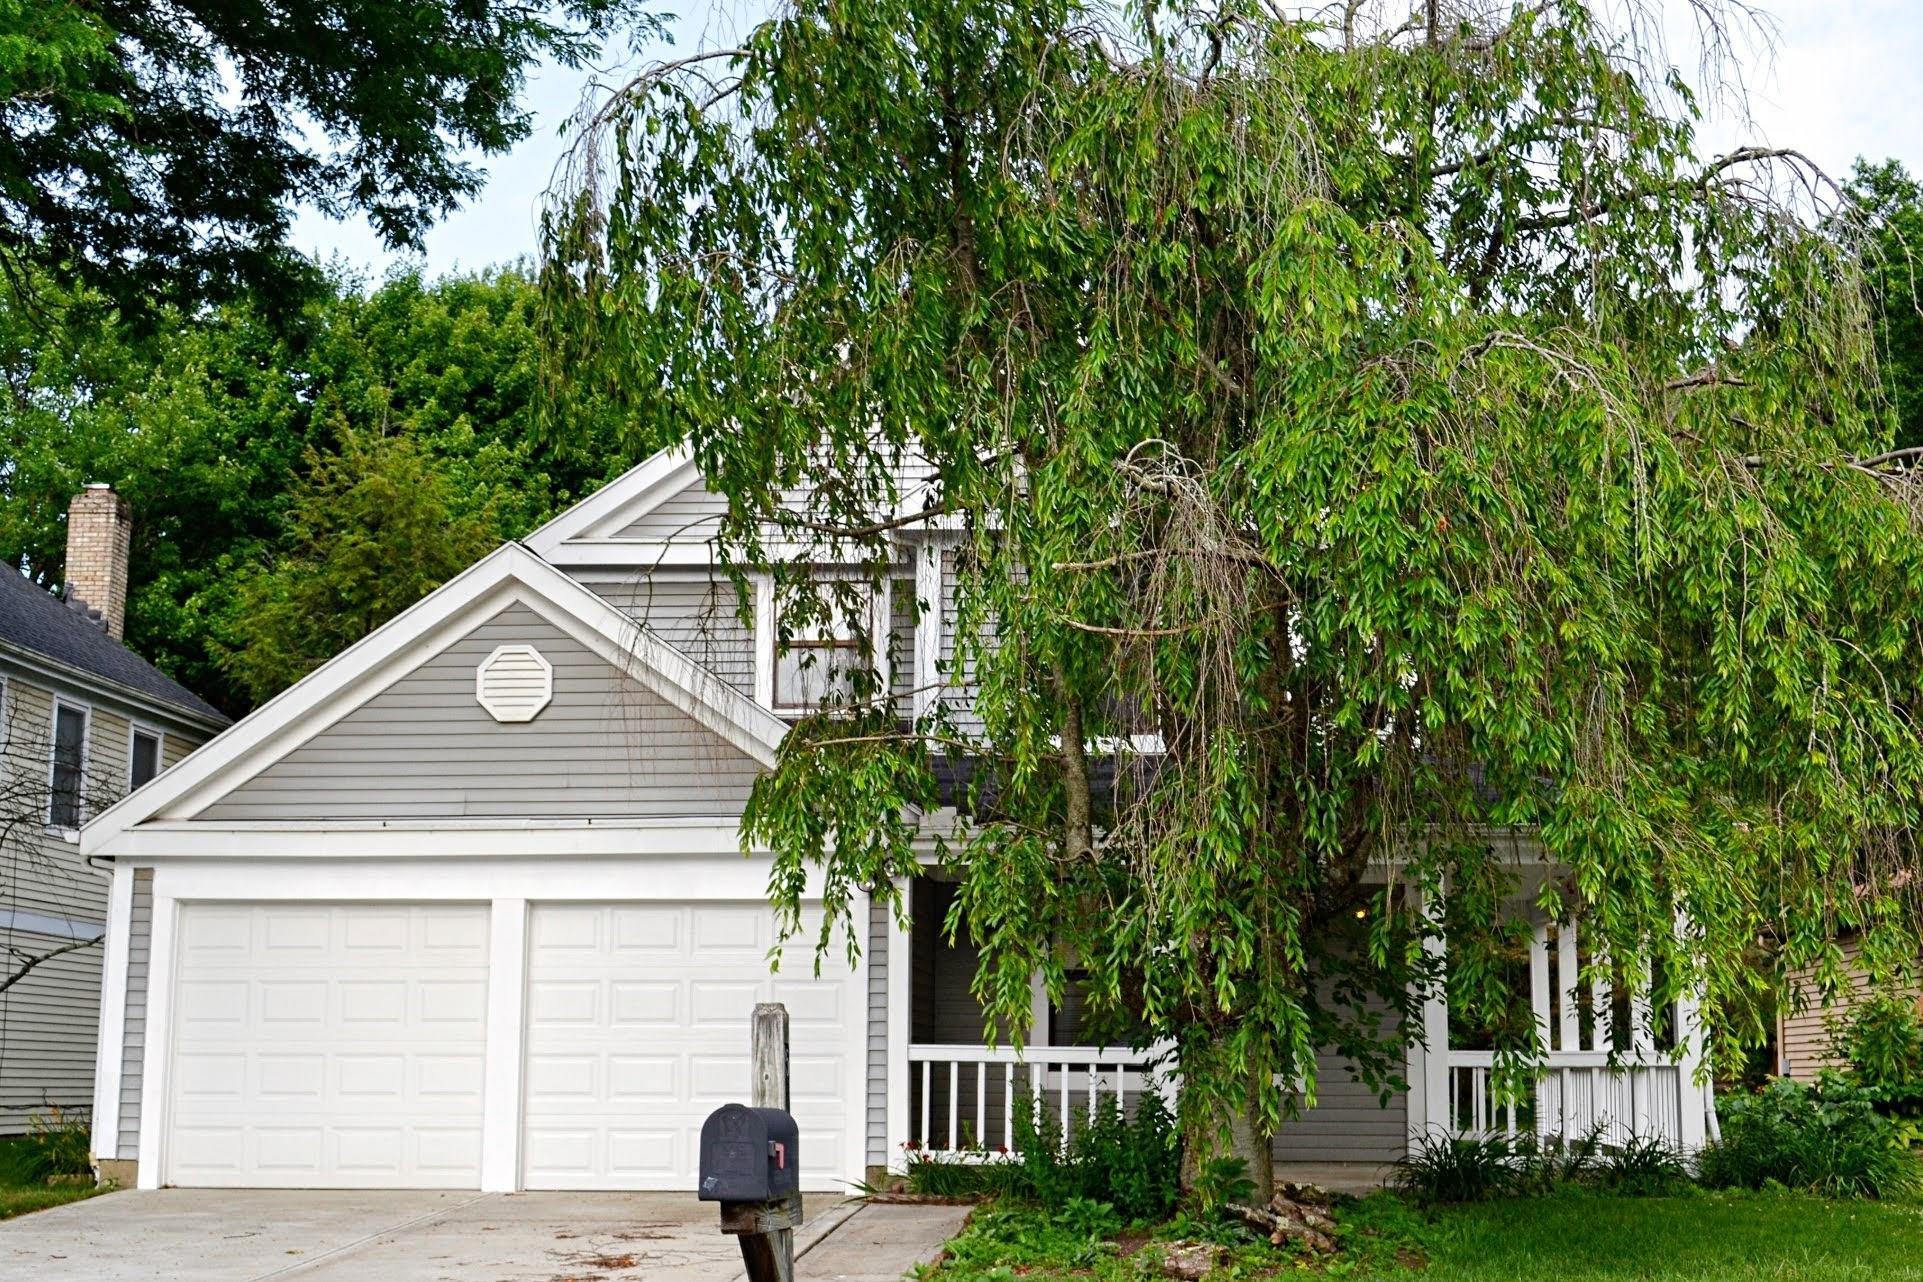 5249 Mardela Drive, Westerville, Ohio 43081, 3 Bedrooms Bedrooms, ,3 BathroomsBathrooms,Residential,For Sale,Mardela,220021022